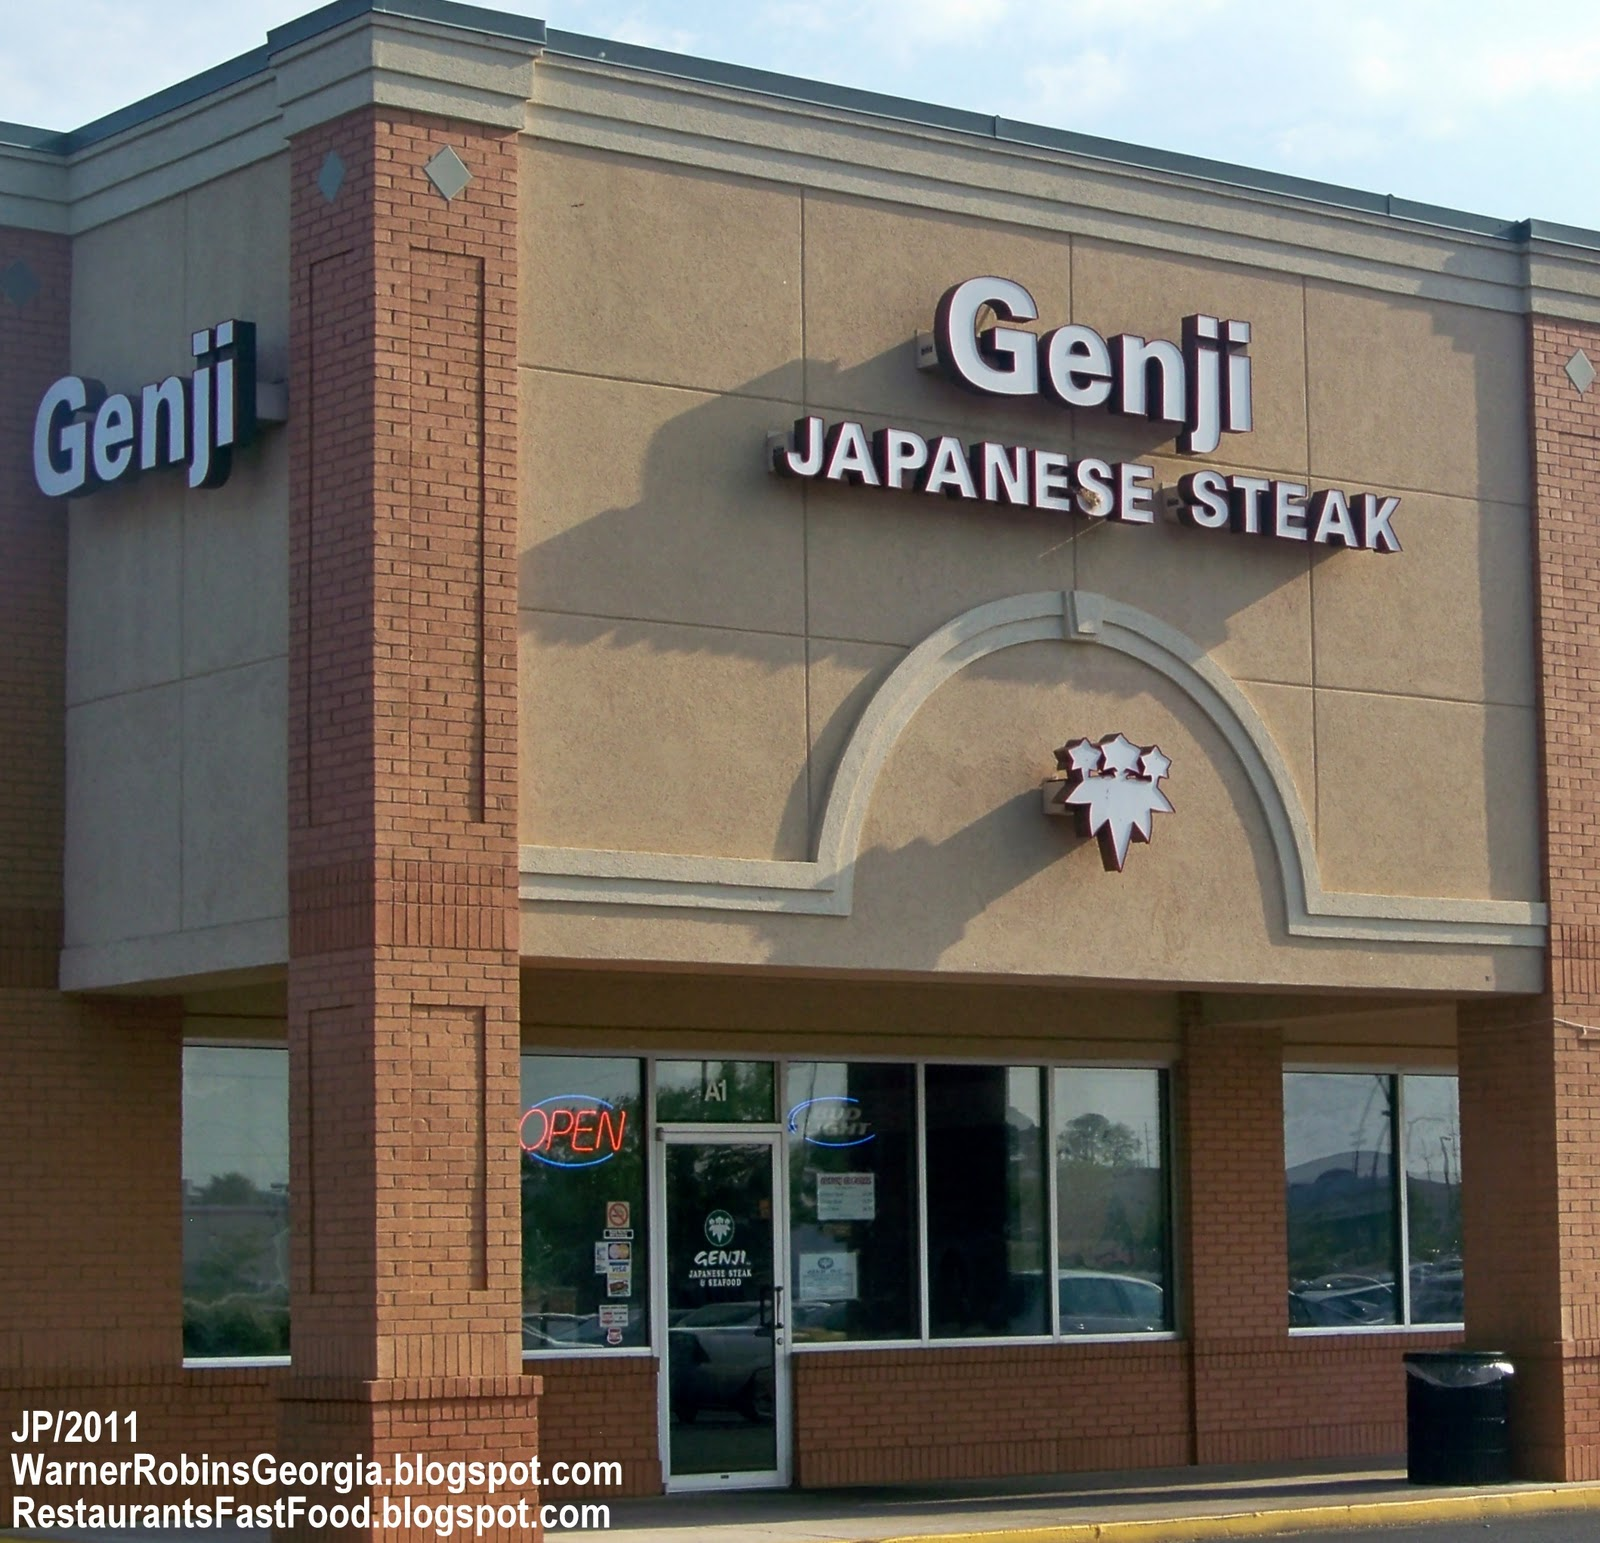 Genji Warner Robins Georgia Anese Steakhouse Seafood Restaurant Watson Blvd Steak House Houston County Ga